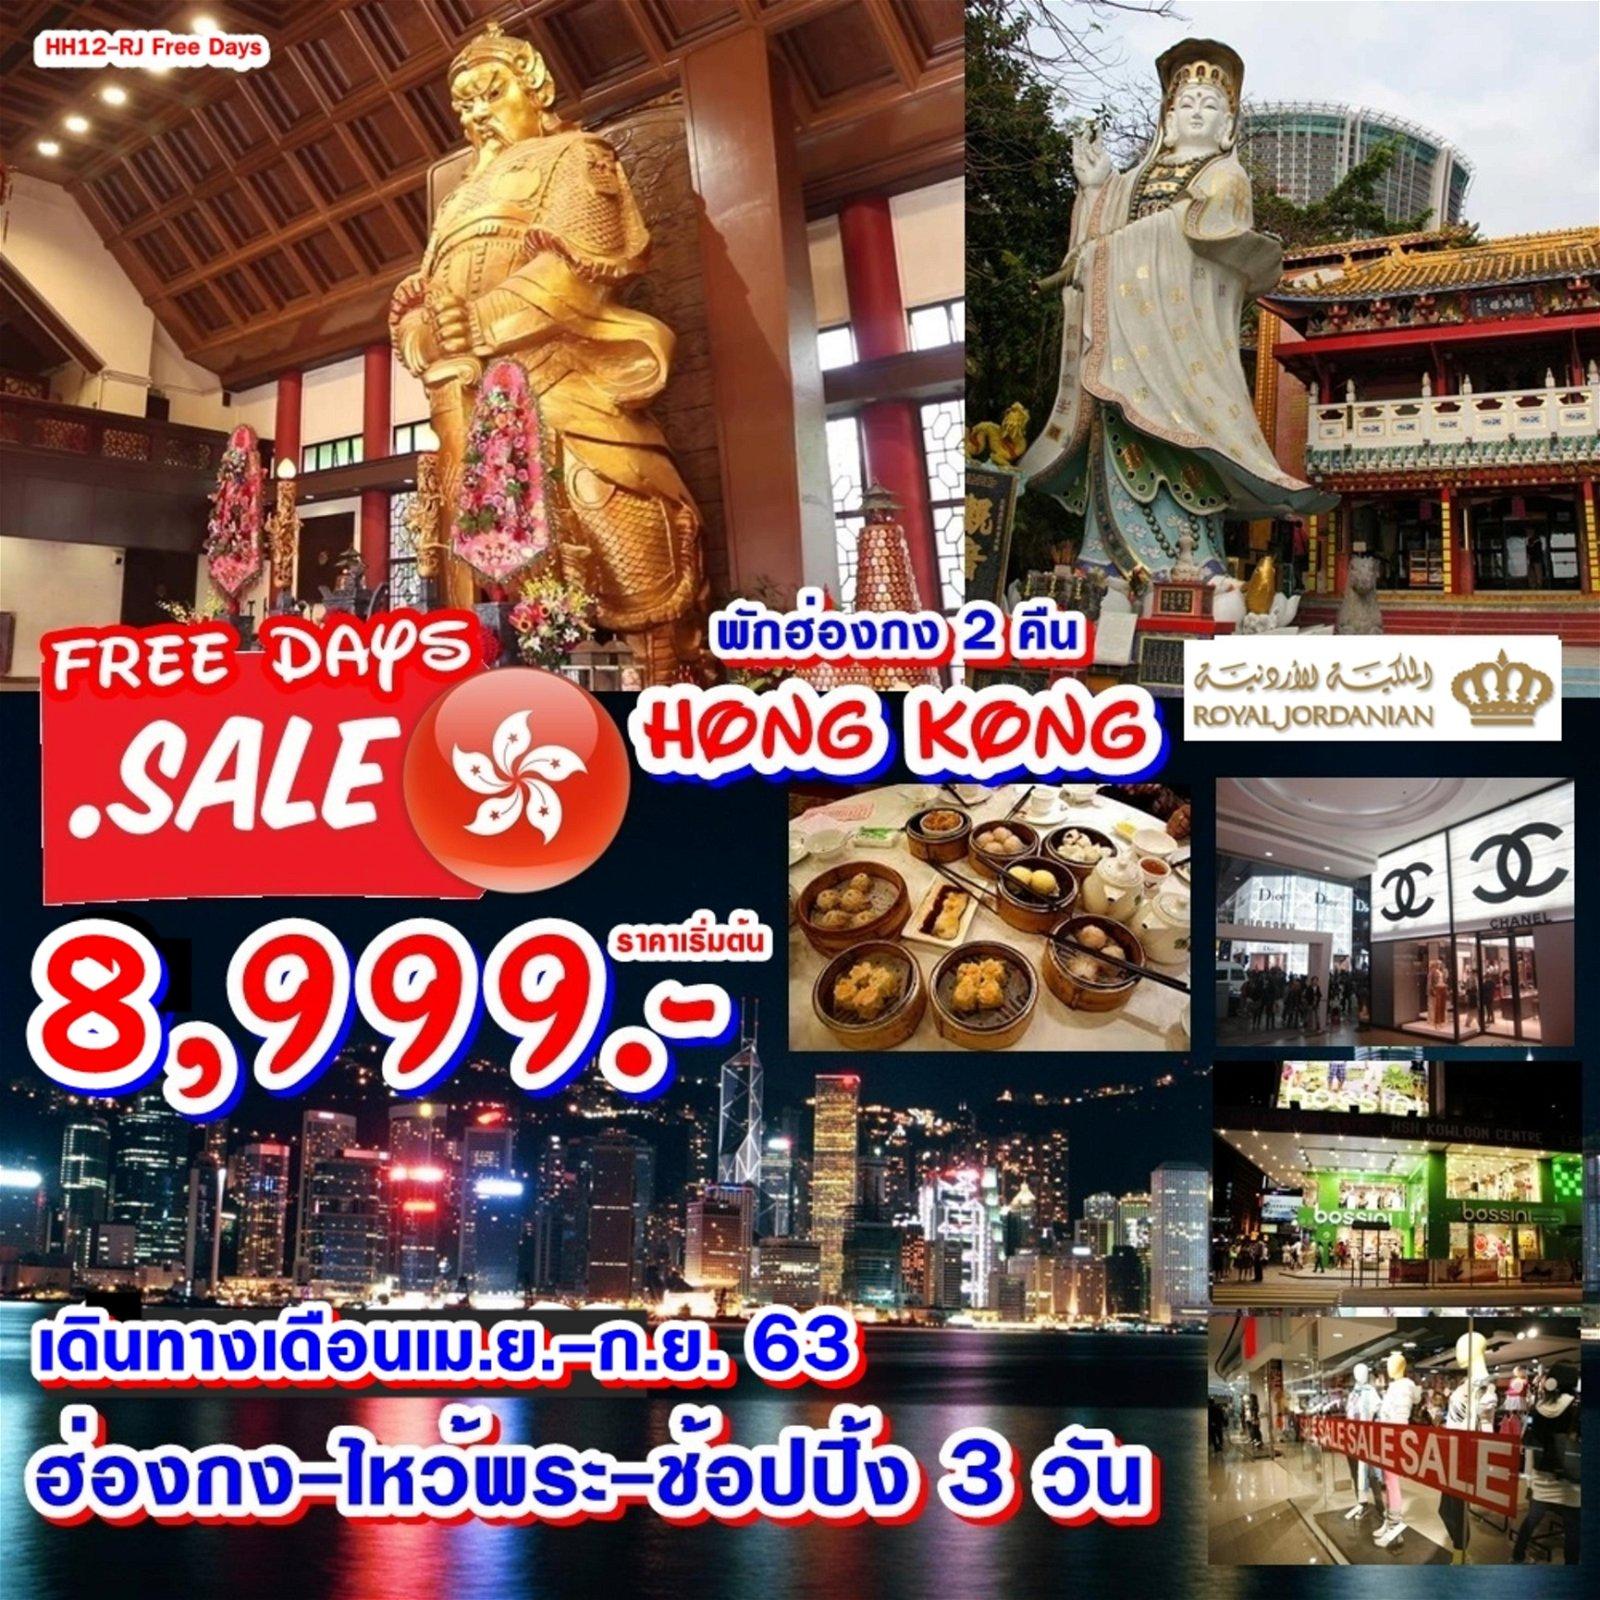 HH12-RJ Free days Hkg-Shopping 3 Days Apr-Sep